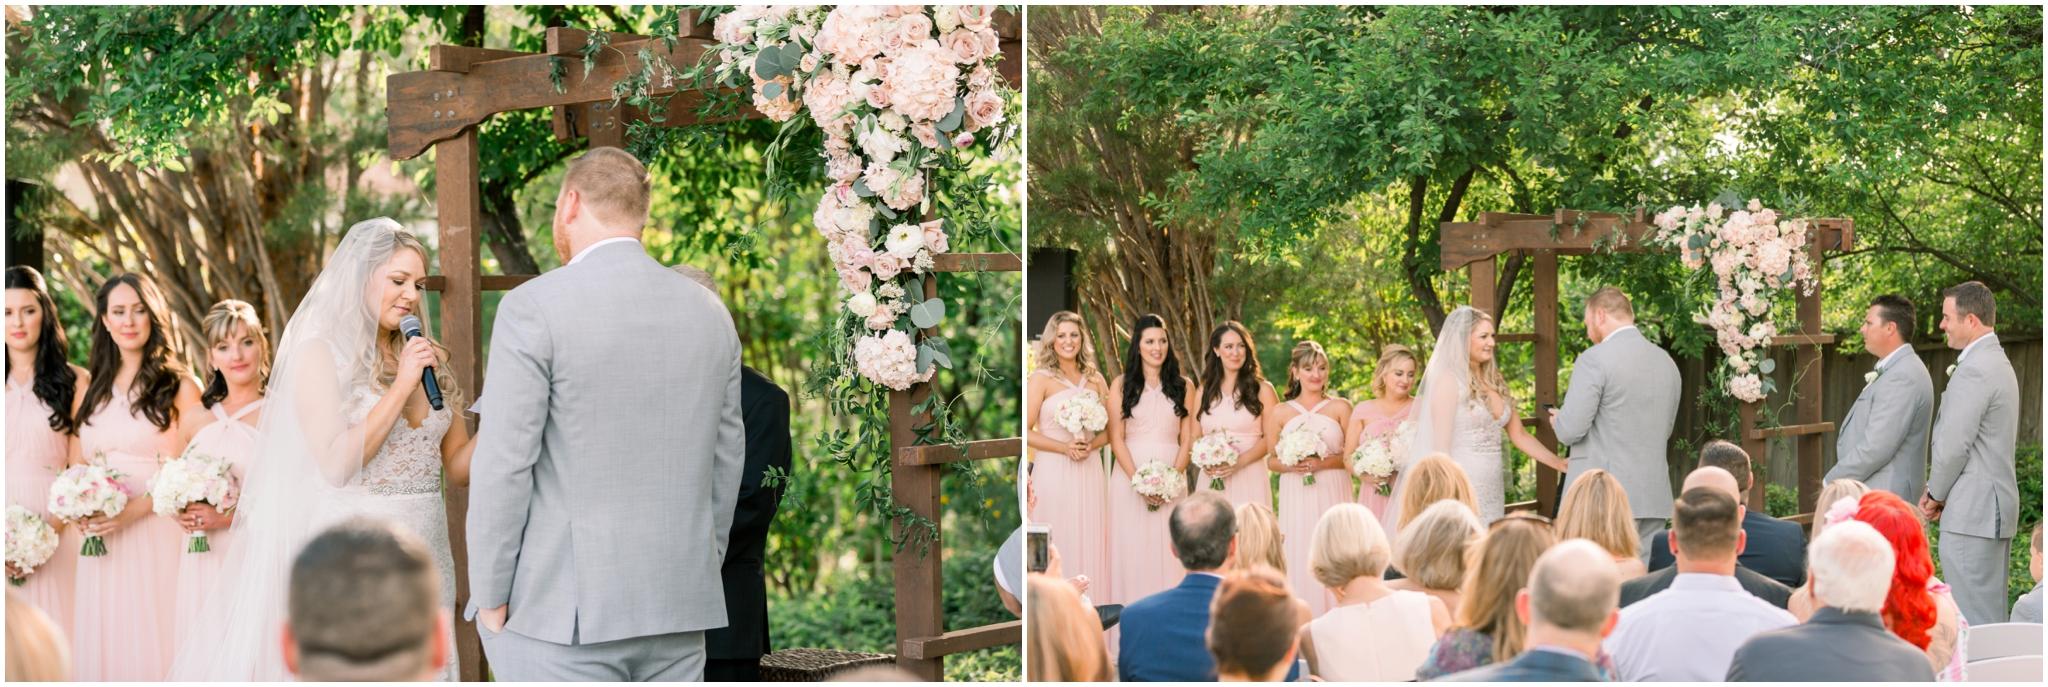 cindy_joseph_wedding_redding_blog_0022.jpg